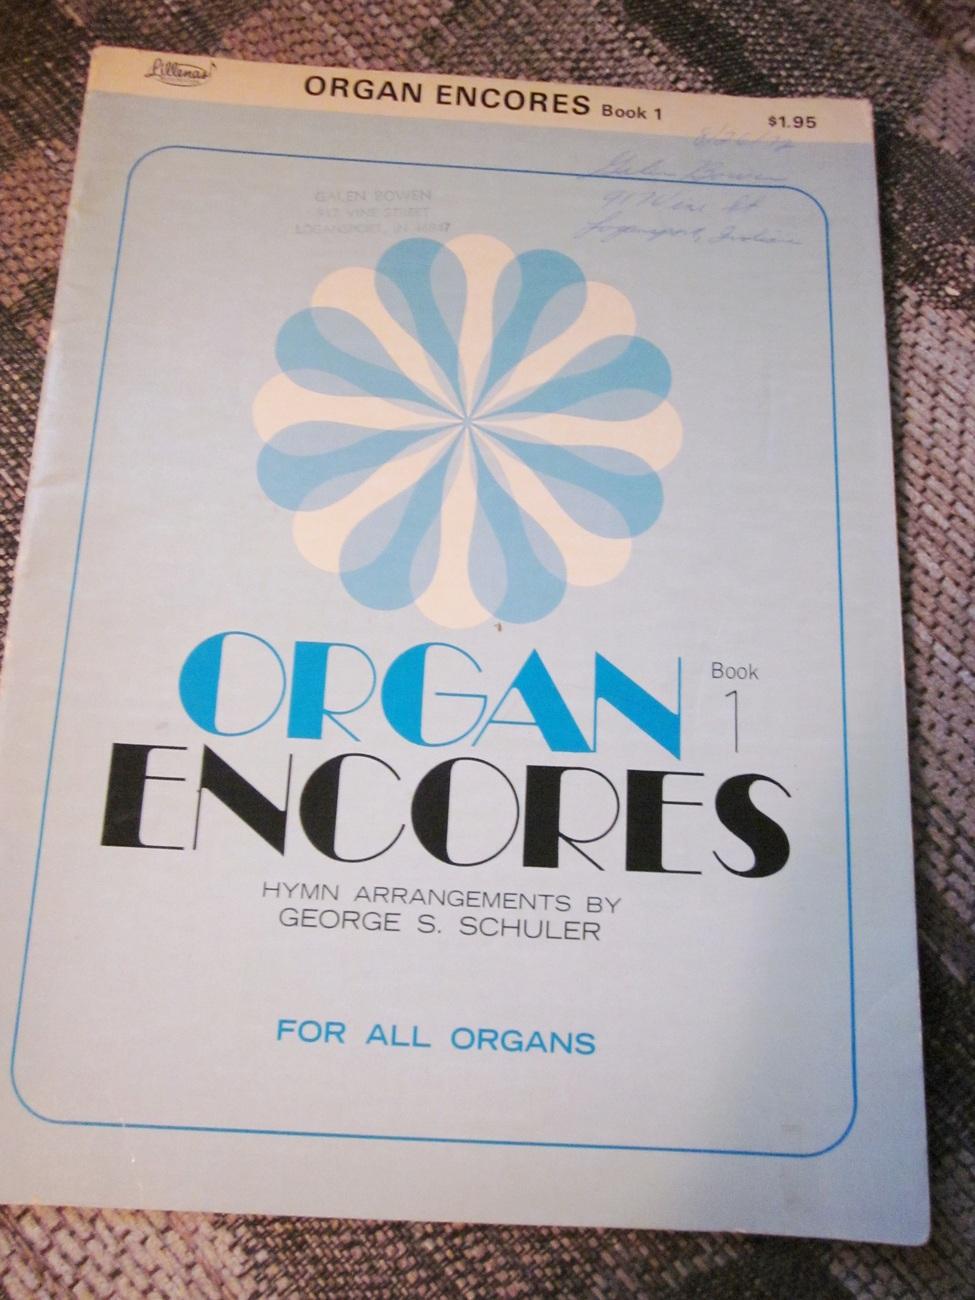 Organ Encores Book One By George Schuler Hymn Arrangements 1955